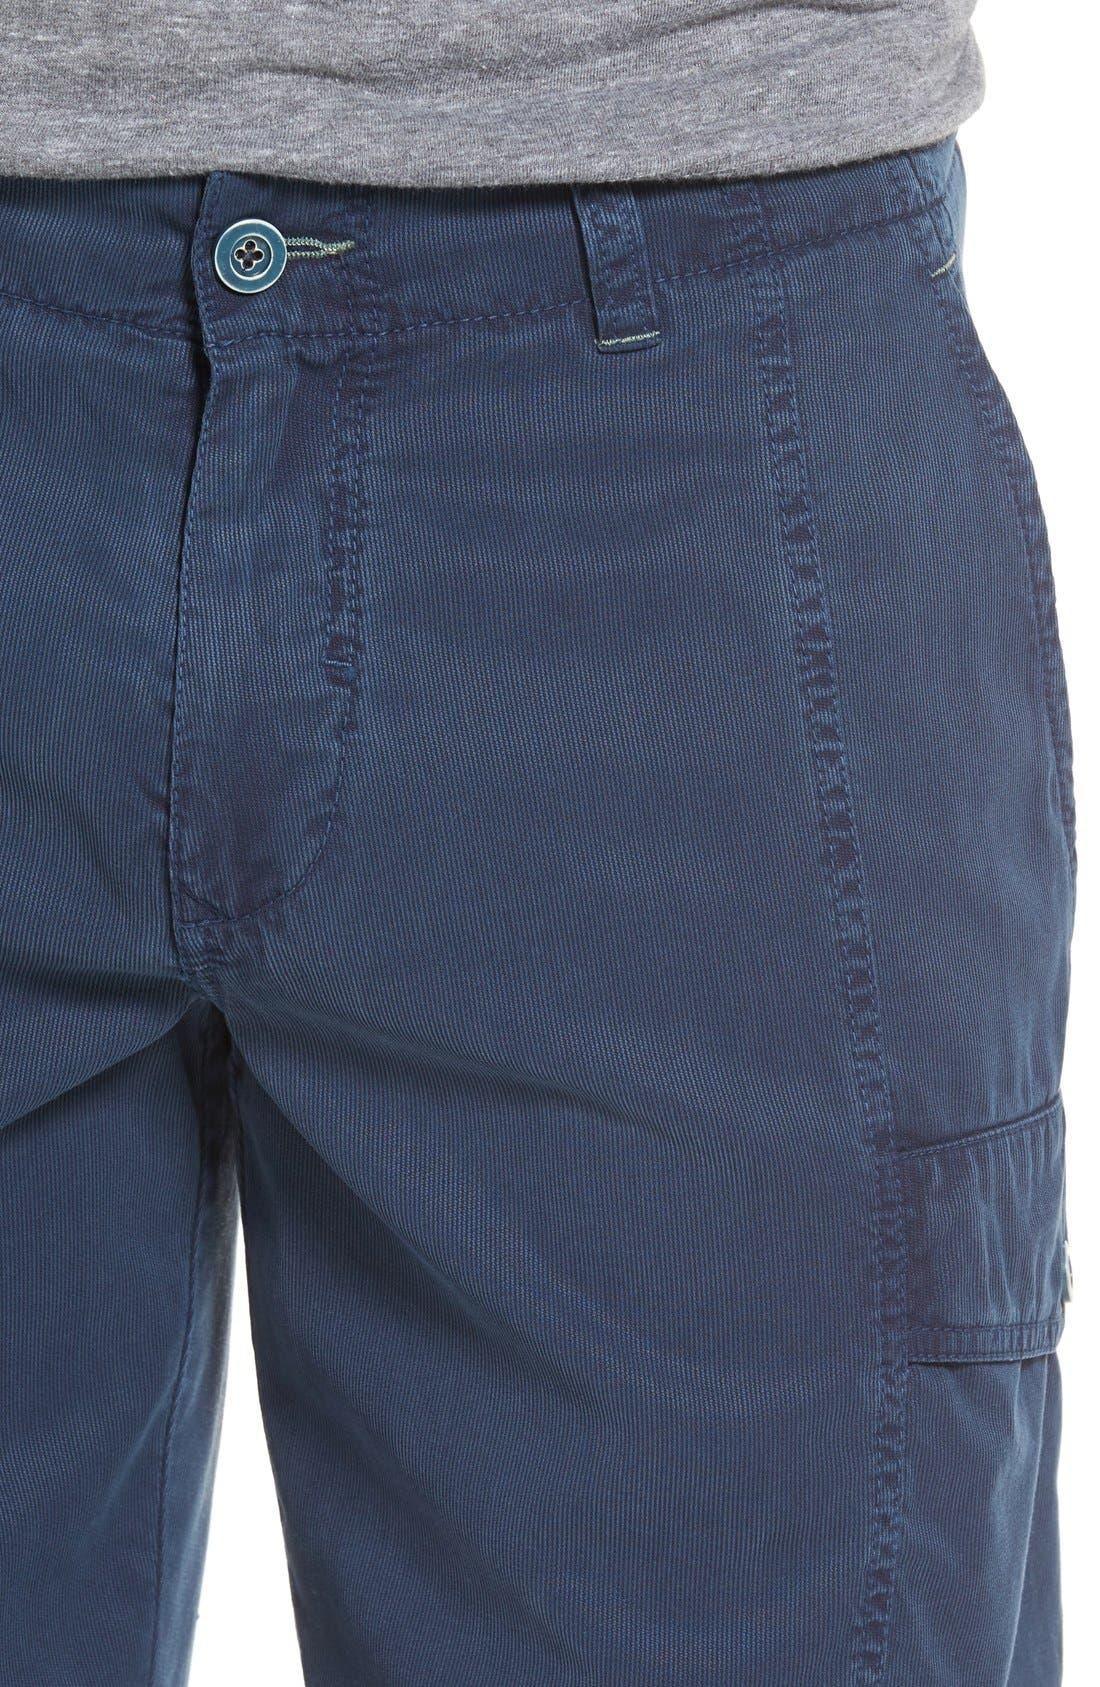 'Beachfront Kihei' Cargo Shorts,                             Alternate thumbnail 4, color,                             Navy